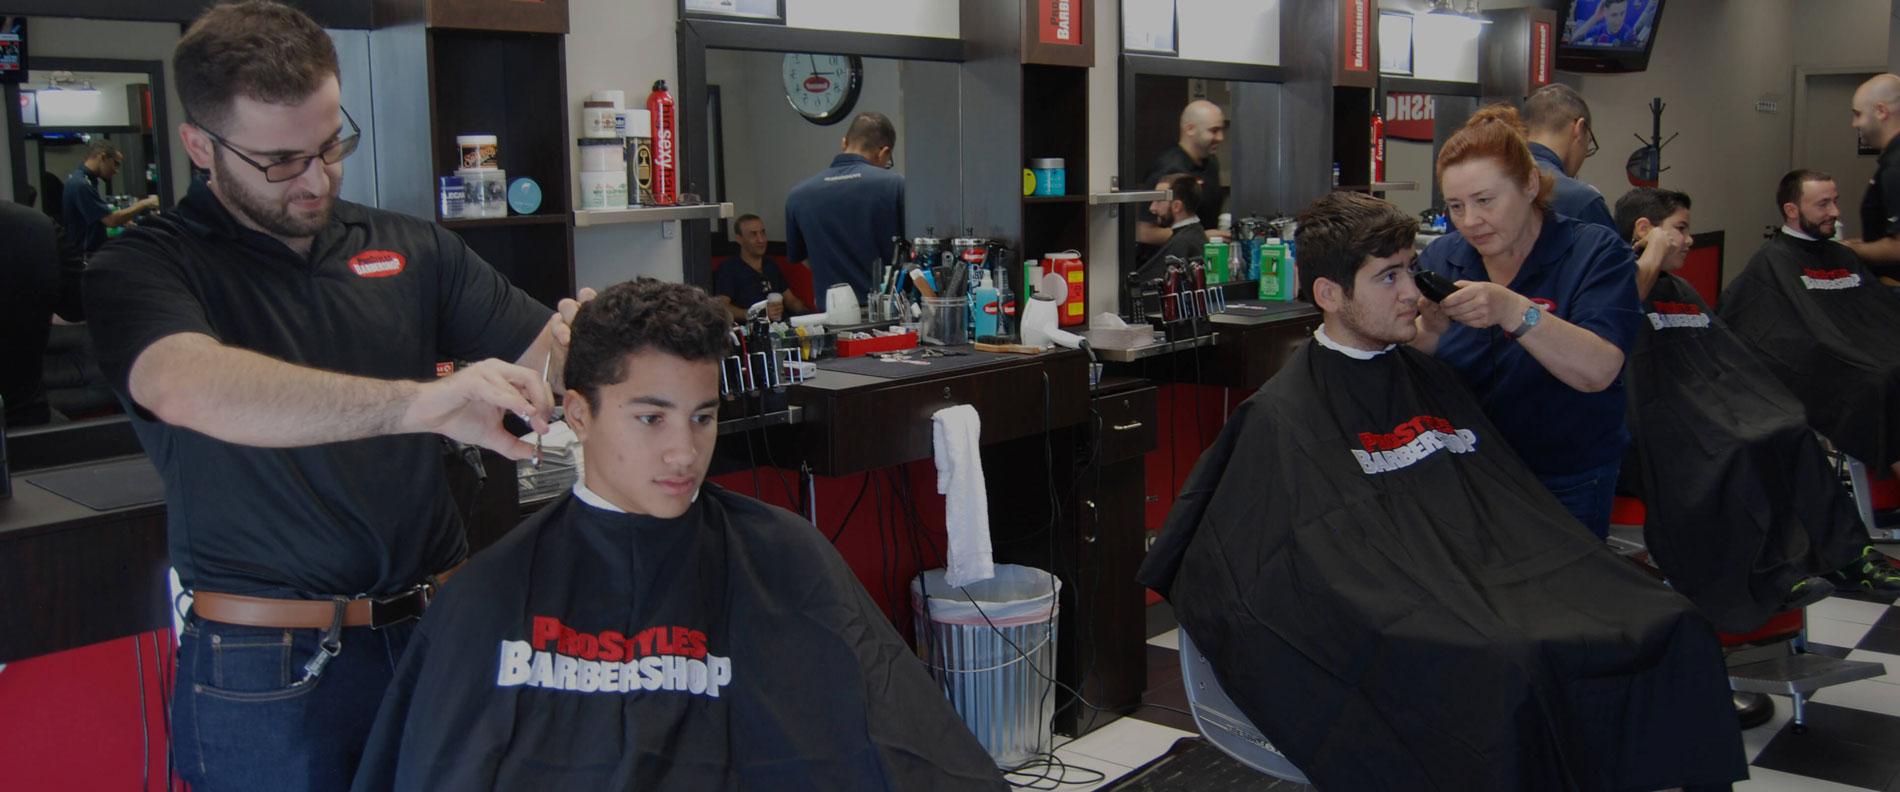 Phoenix Barber Shop Straight Razor Shave Glendale Location